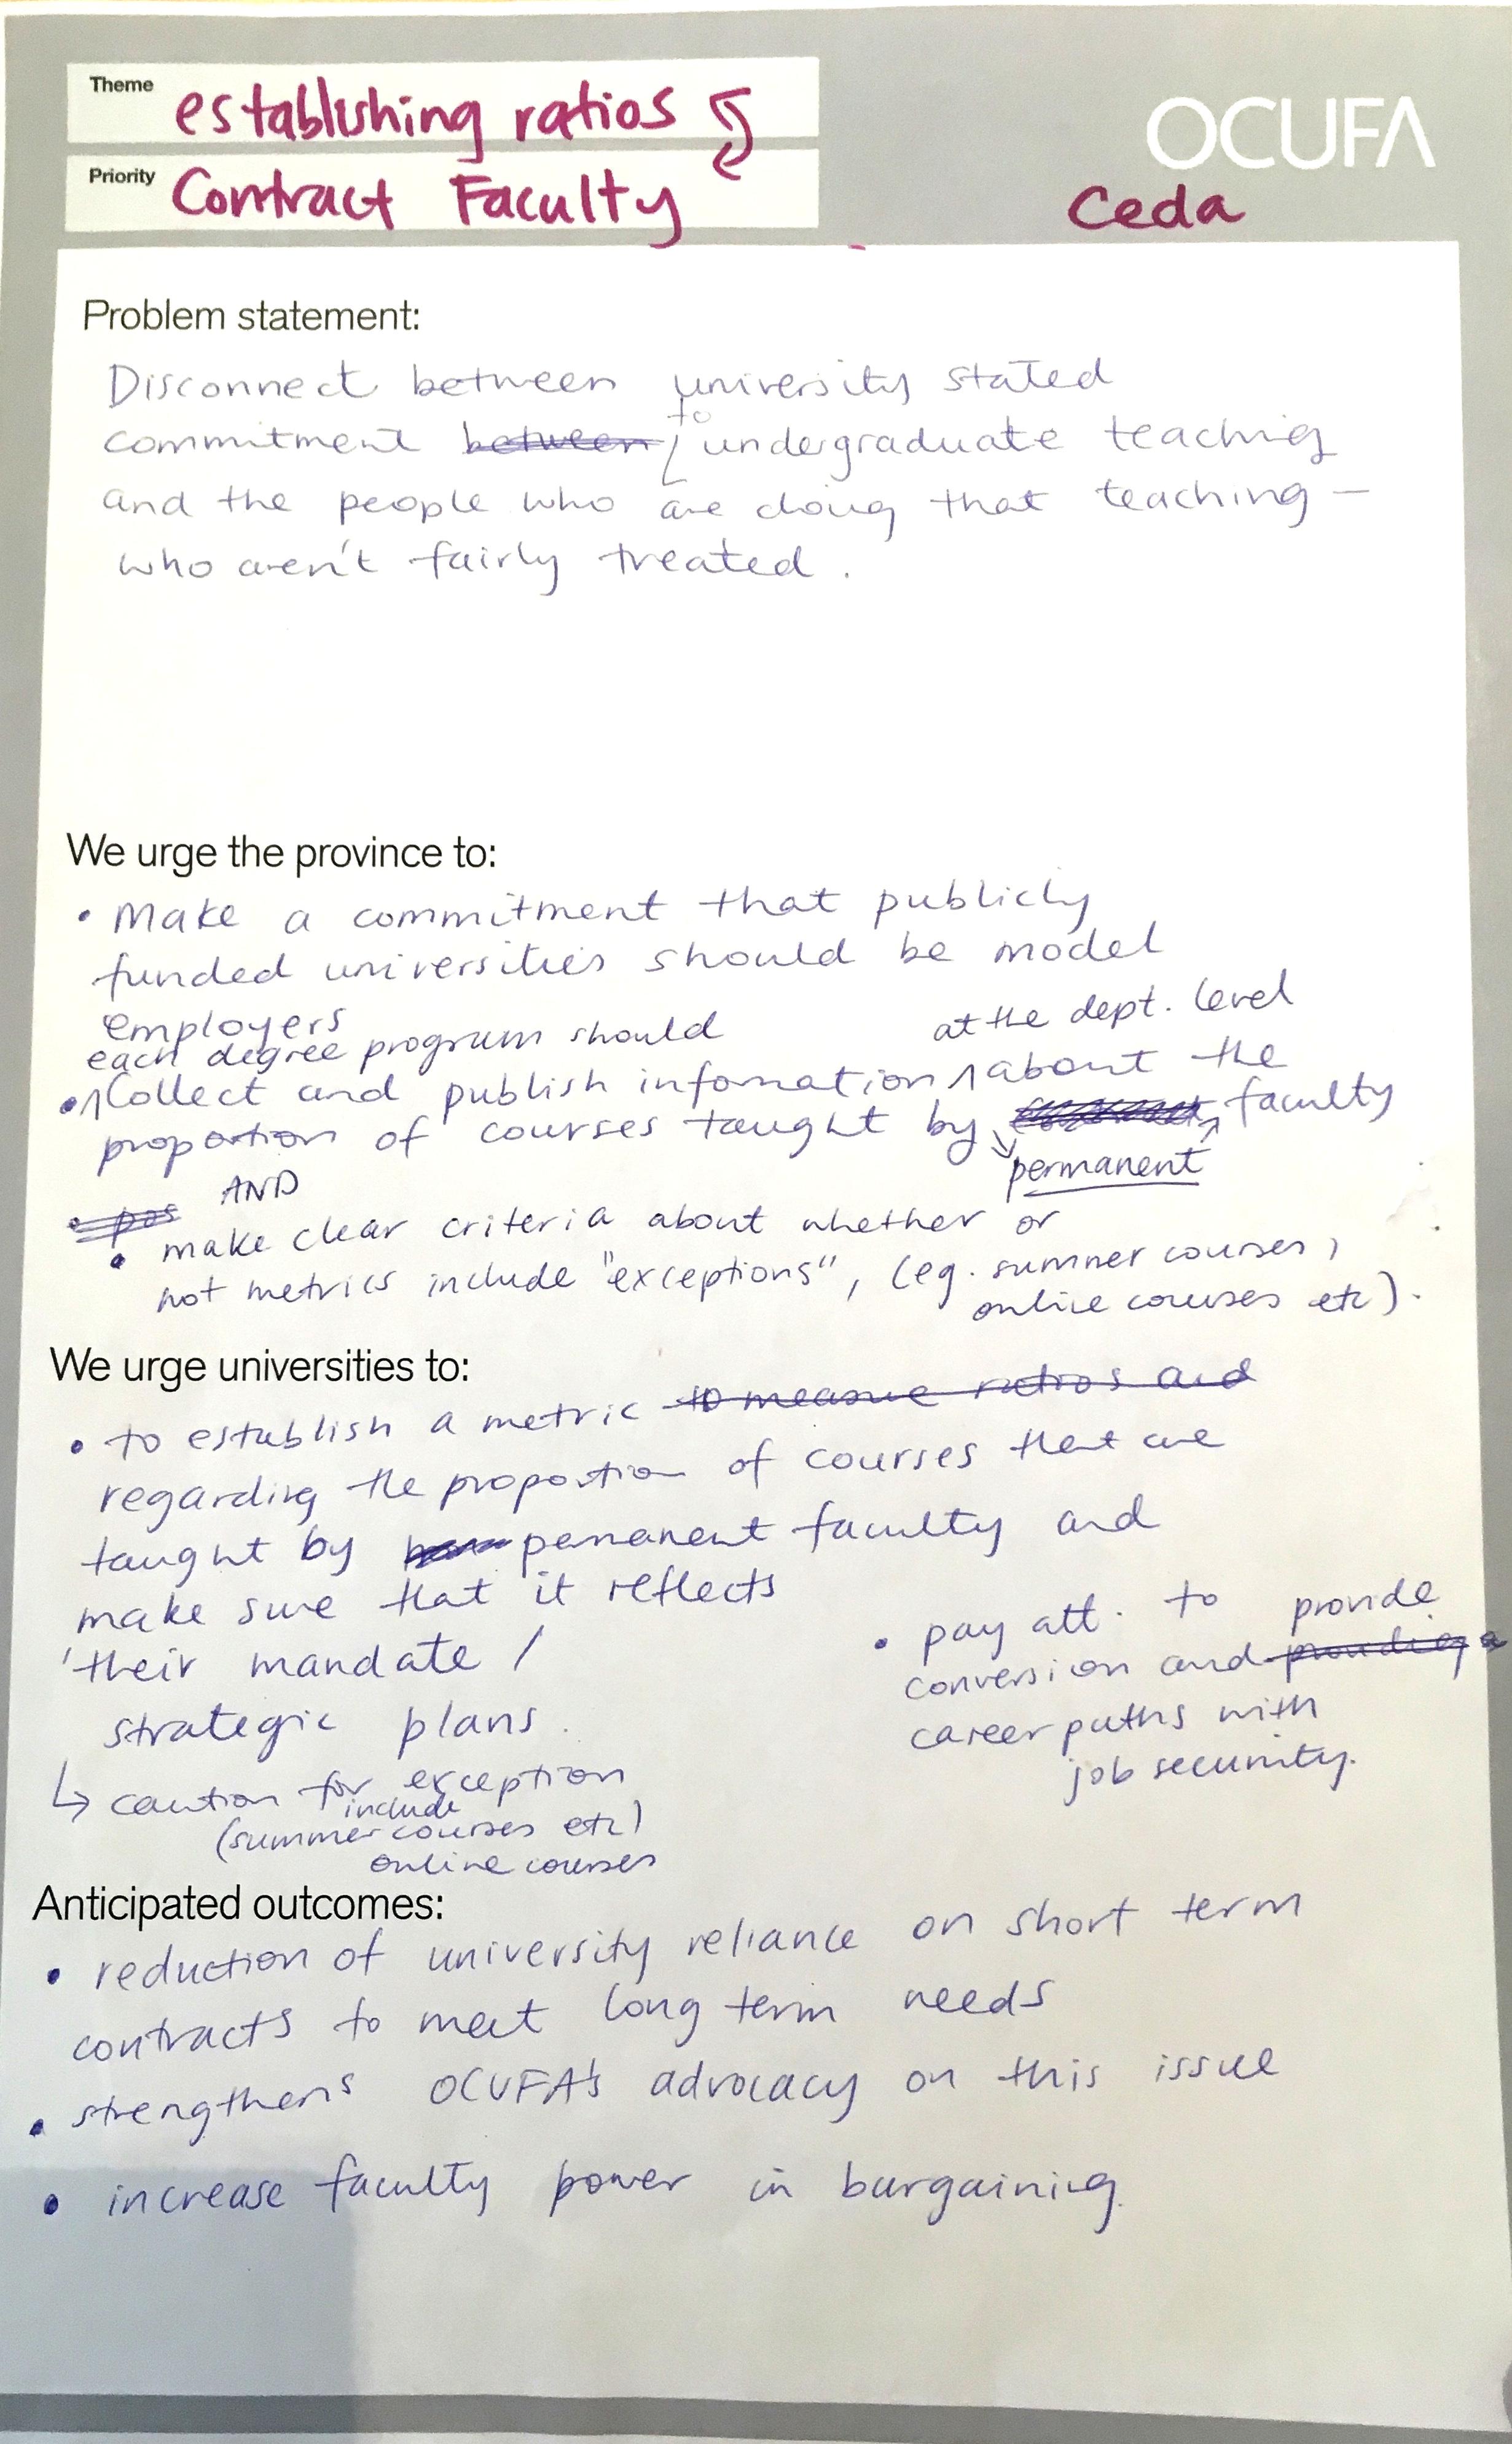 Establishing Ratios, Contract Faculty - Ceda.jpeg